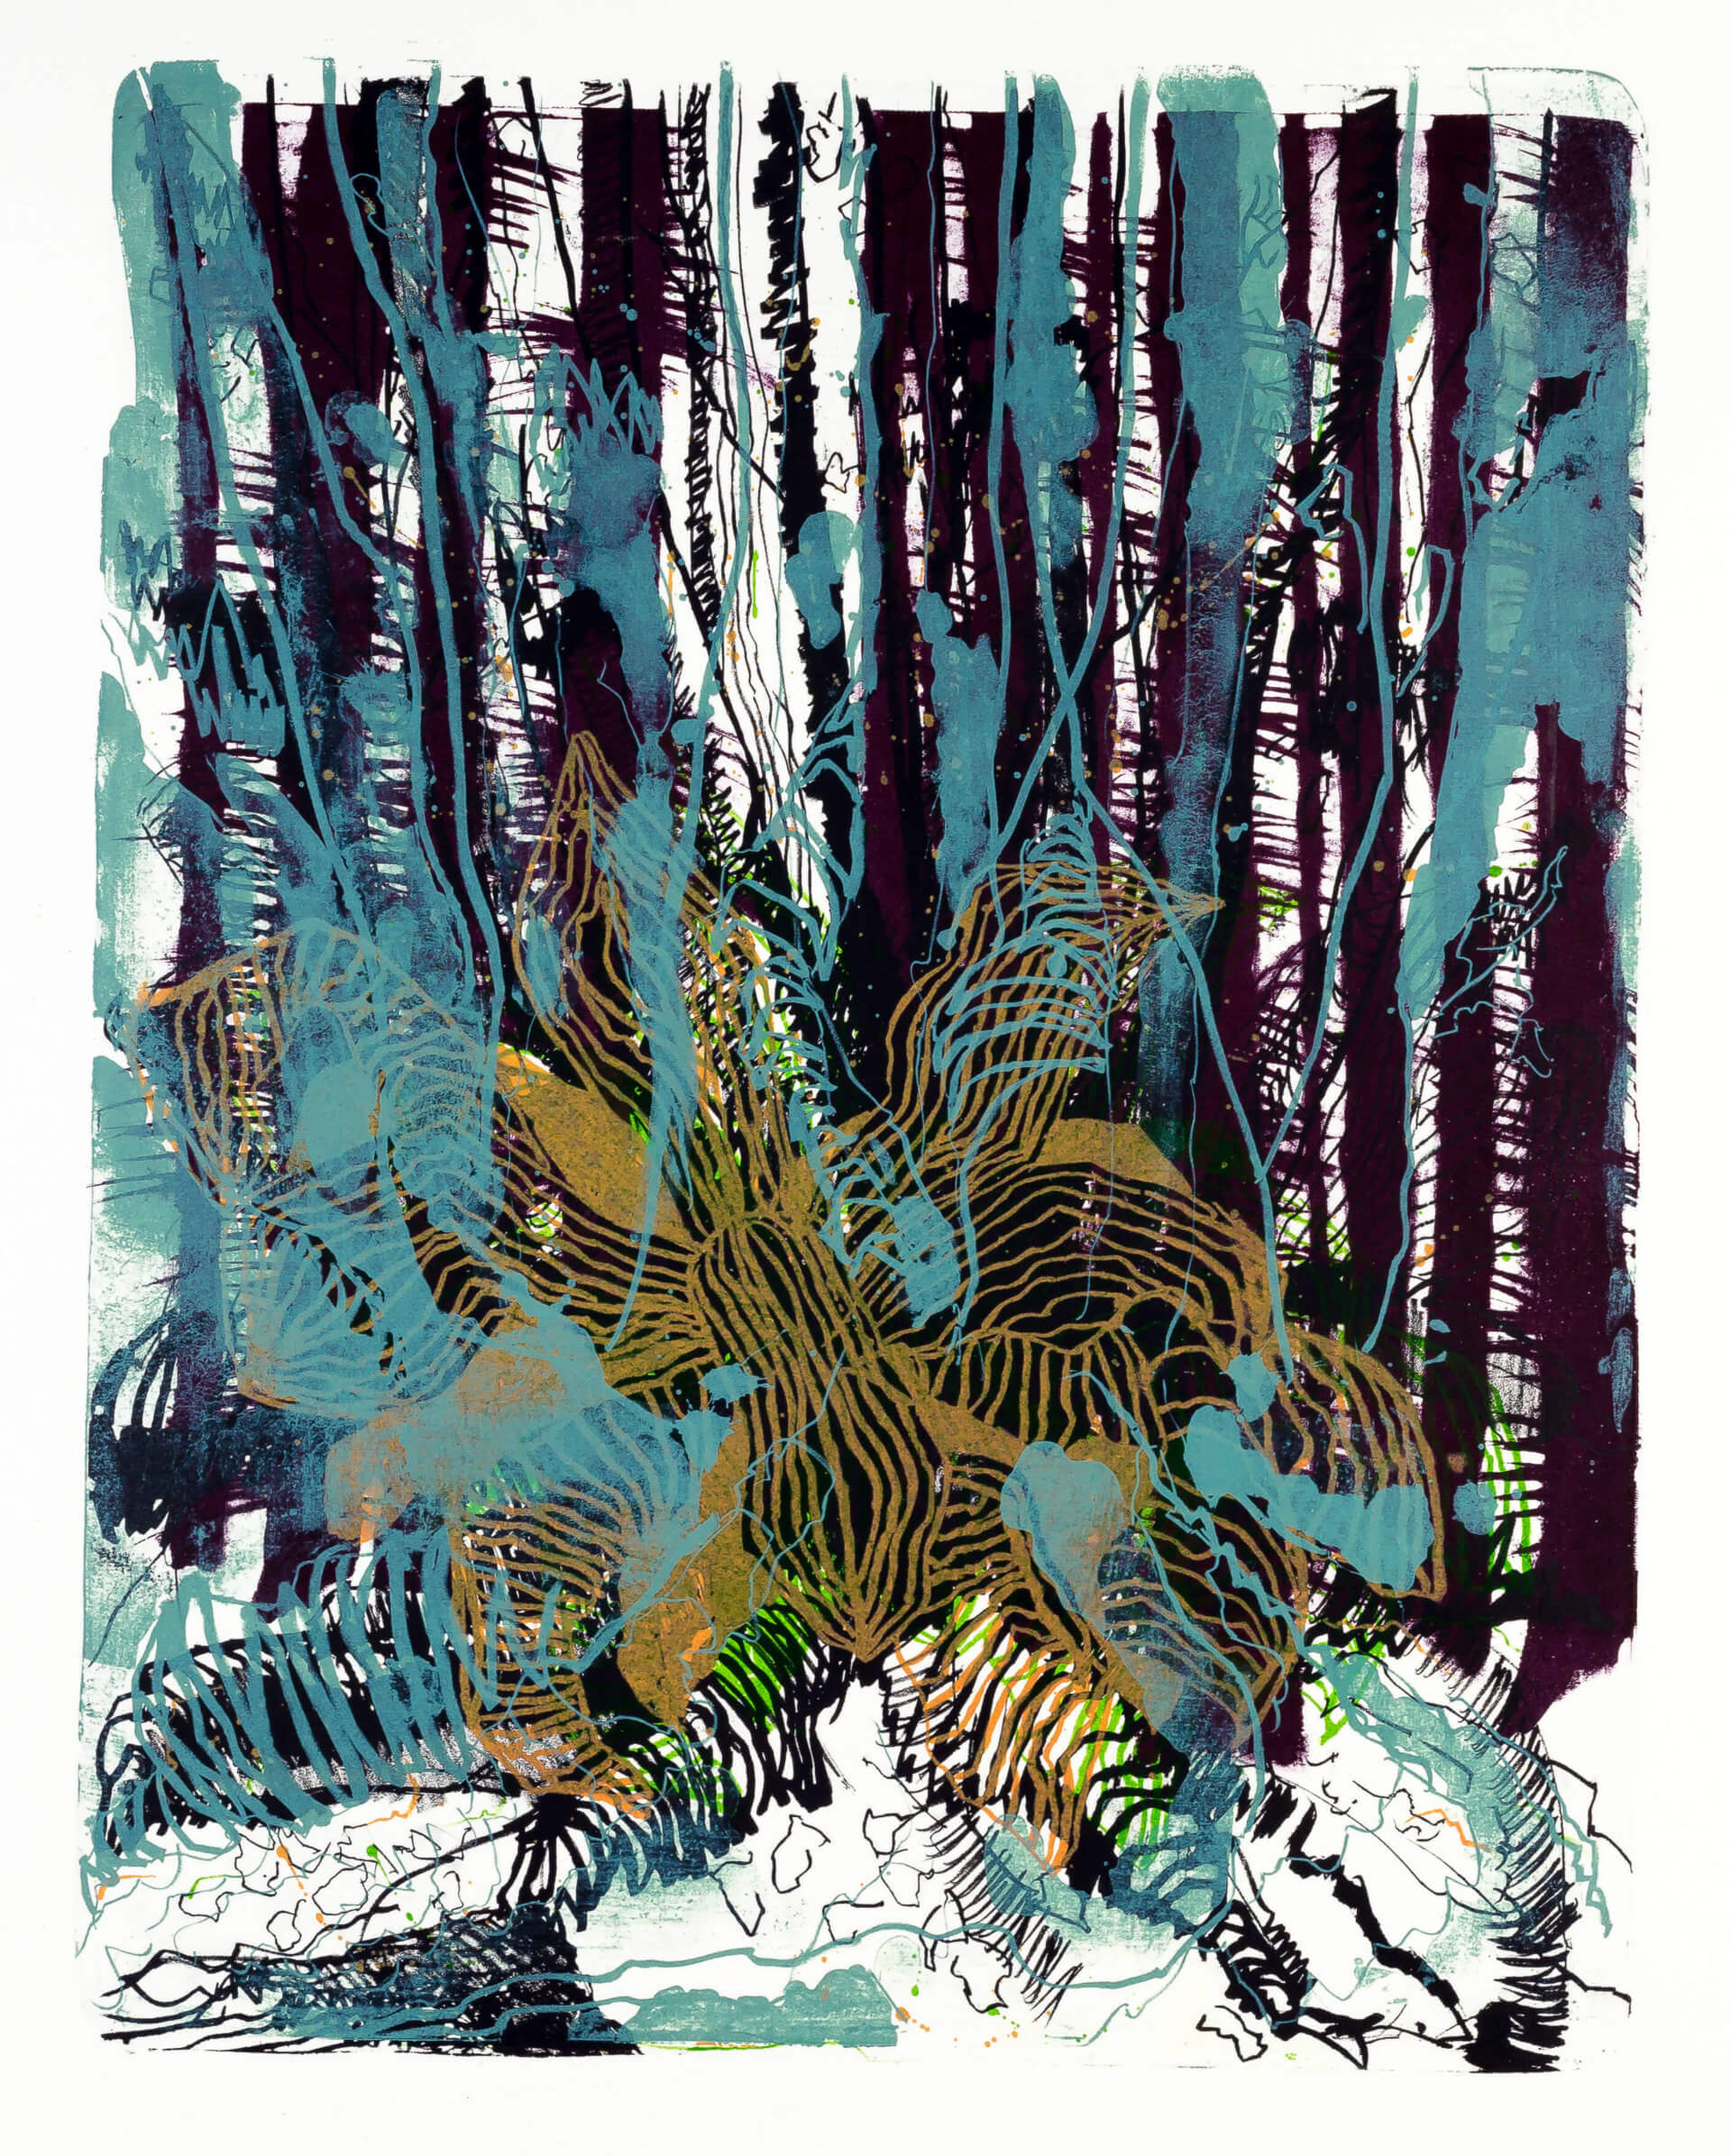 Katharina Albers, Wald X-II, 2015, Farblithographie, Unikat, 50×40 cm